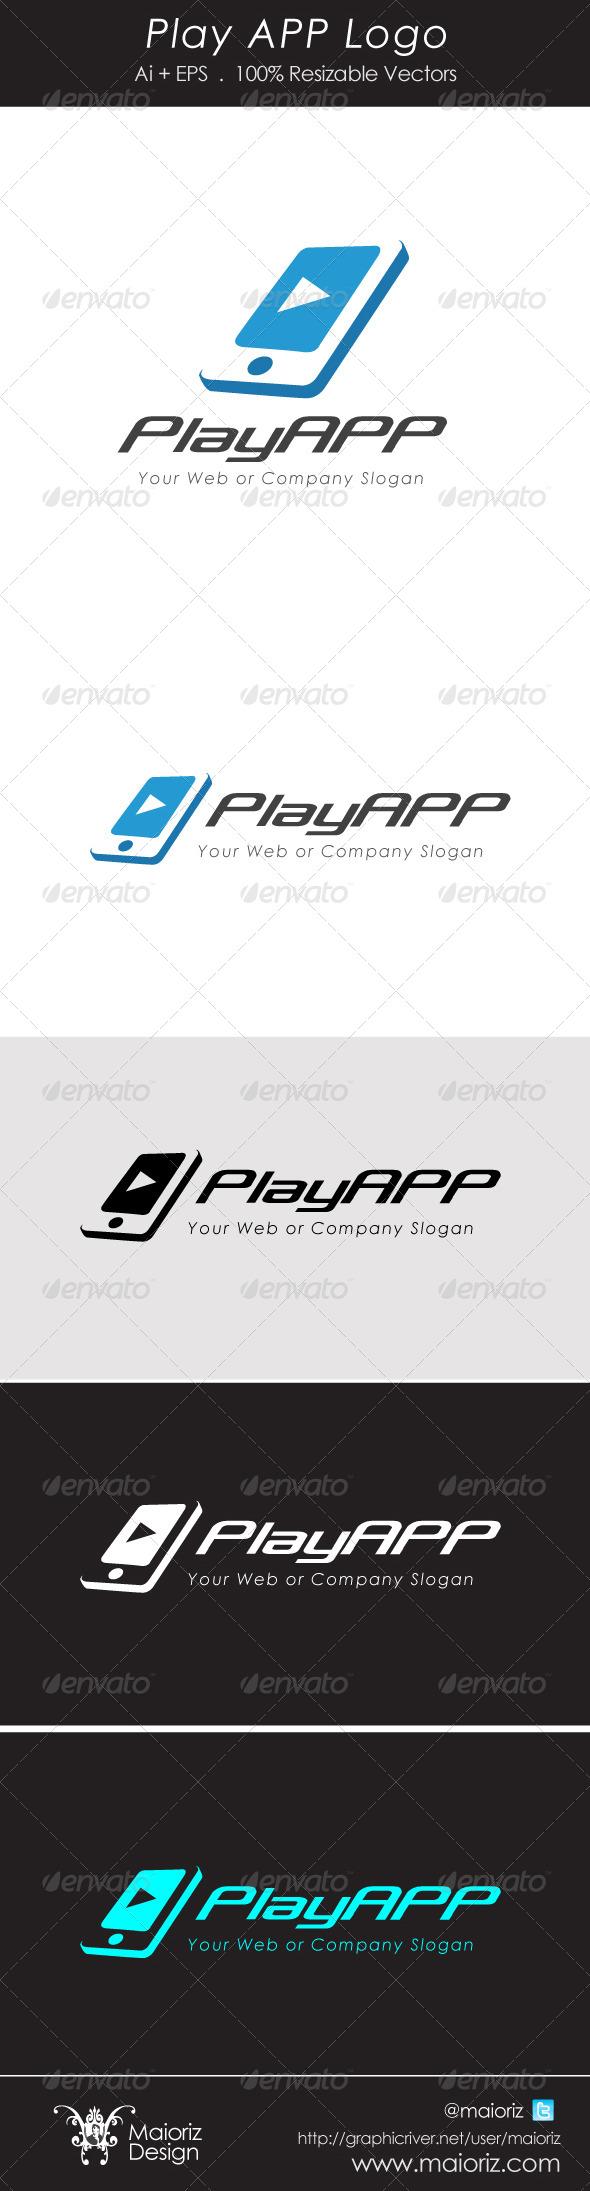 GraphicRiver Play App Logotype 4491459